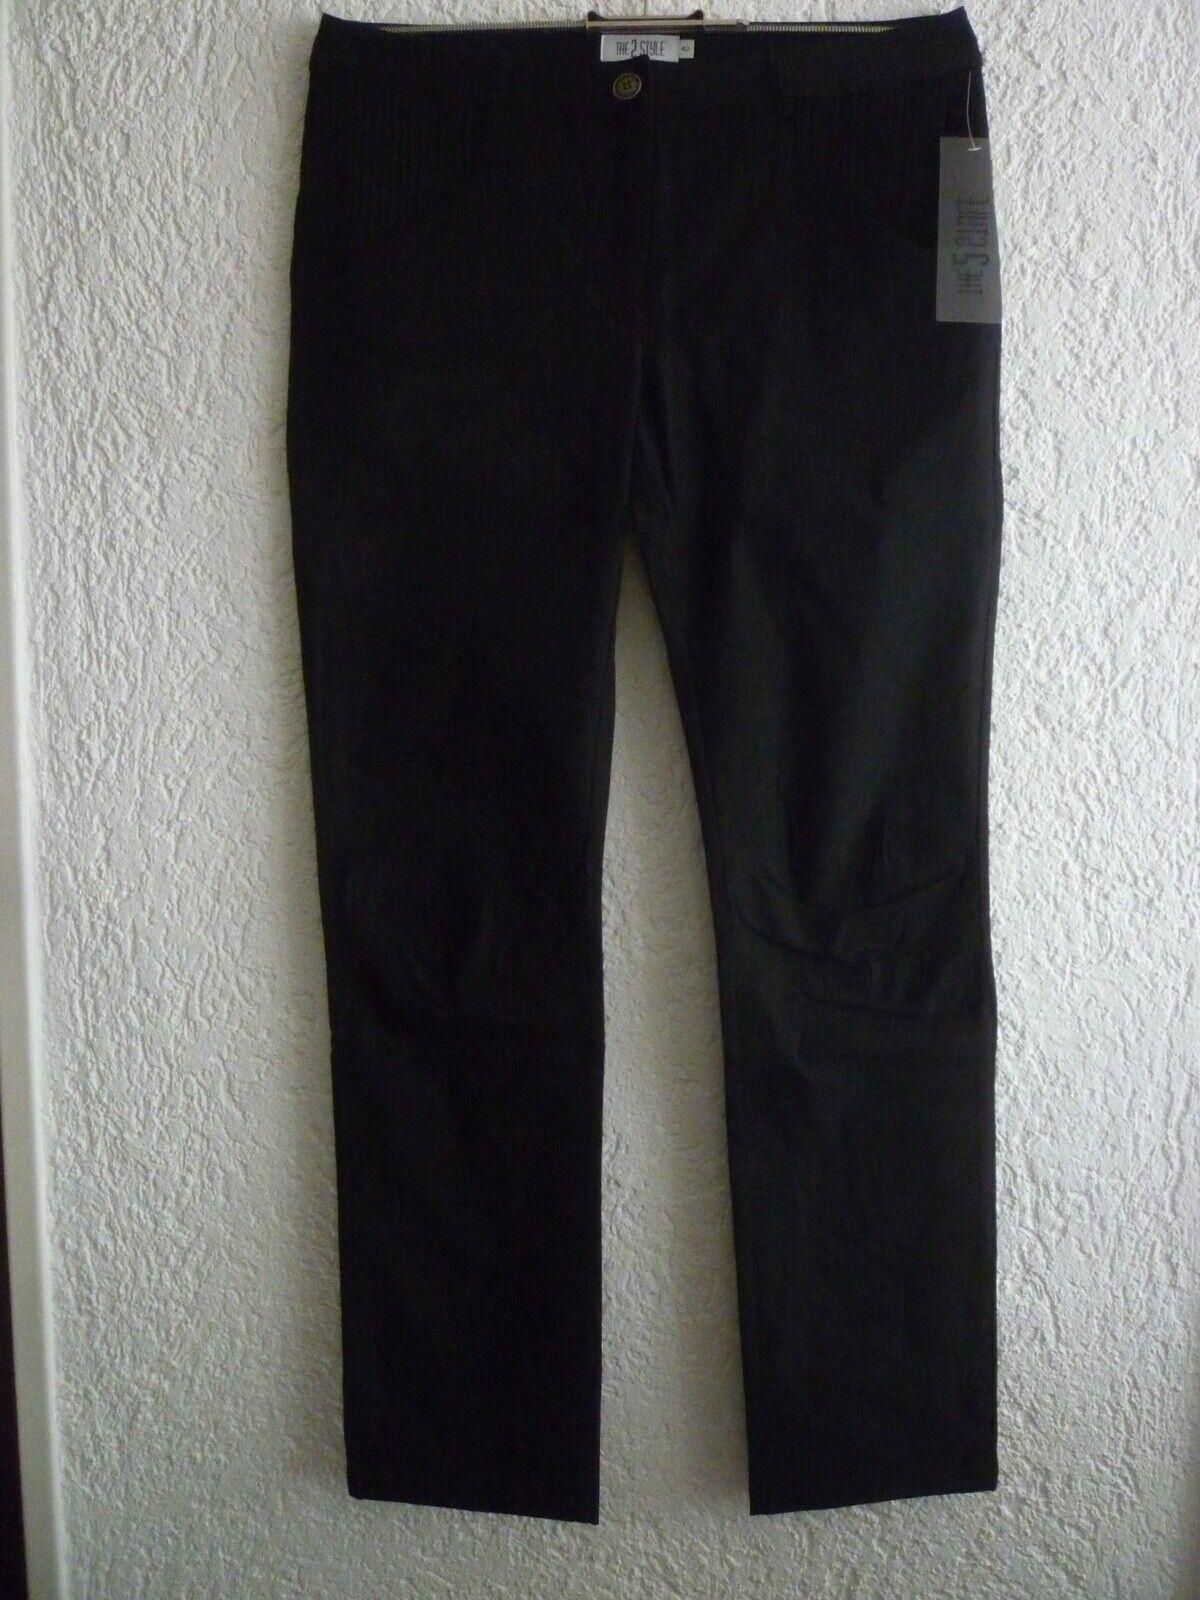 Hose STOFFHOSE Stretch schwarz Gr. 42- THE 2STYLE